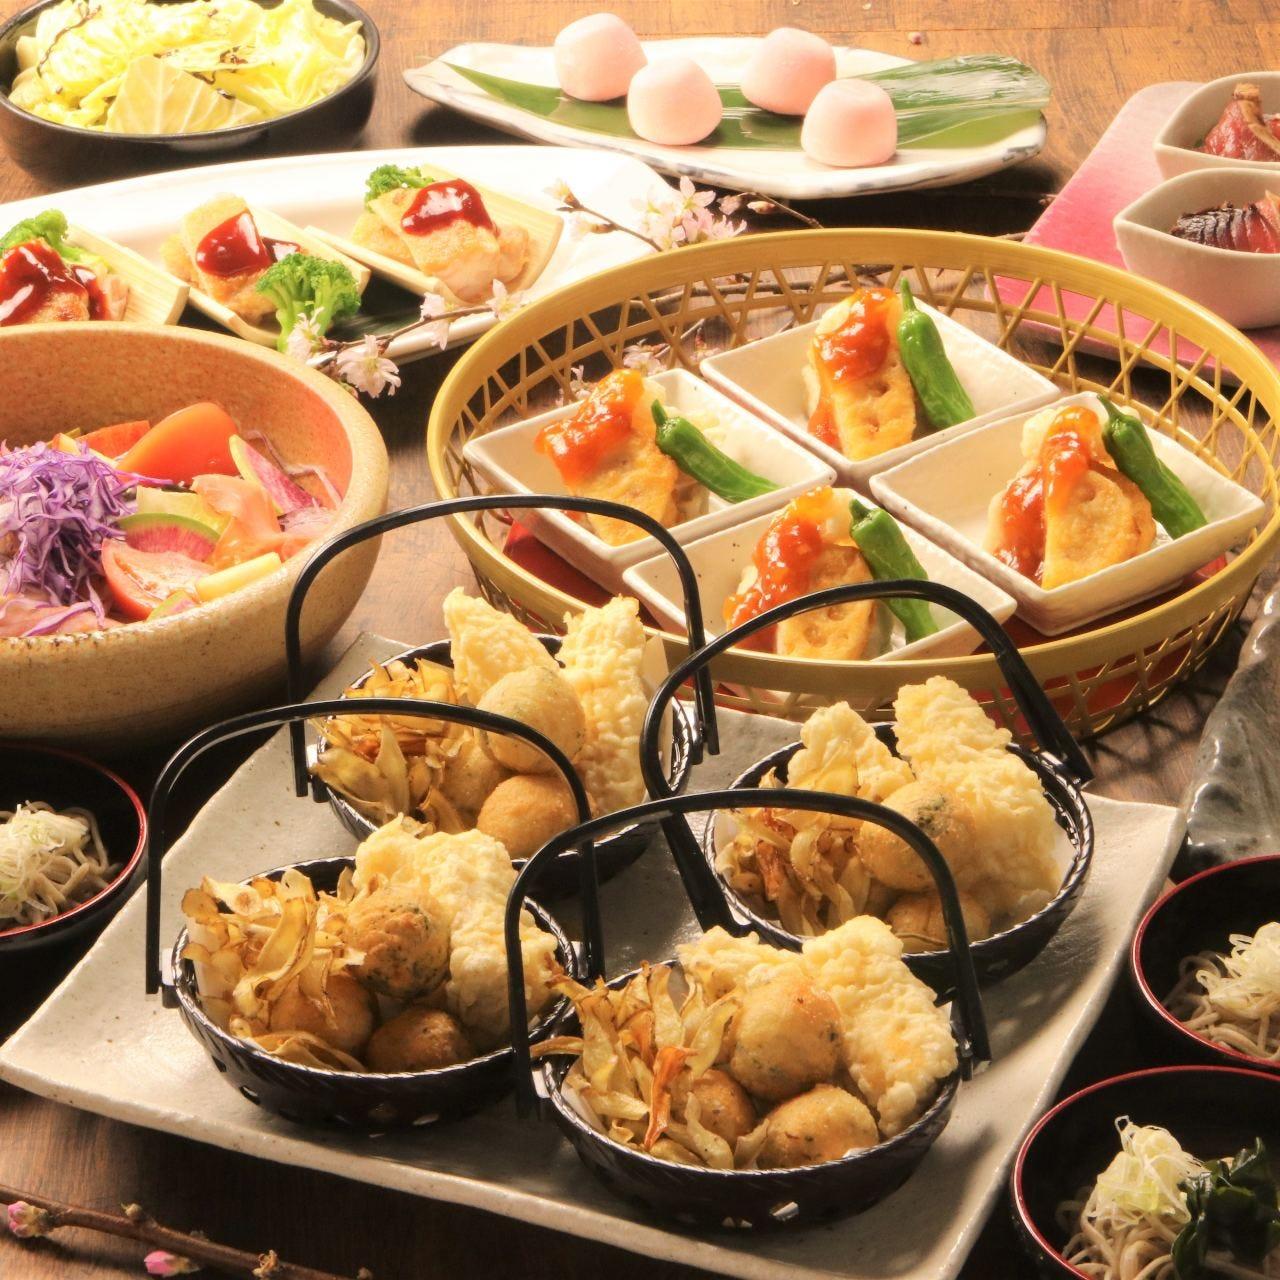 【寧々家のコース】料理9品+2時間飲み放題付3,500円(税込)